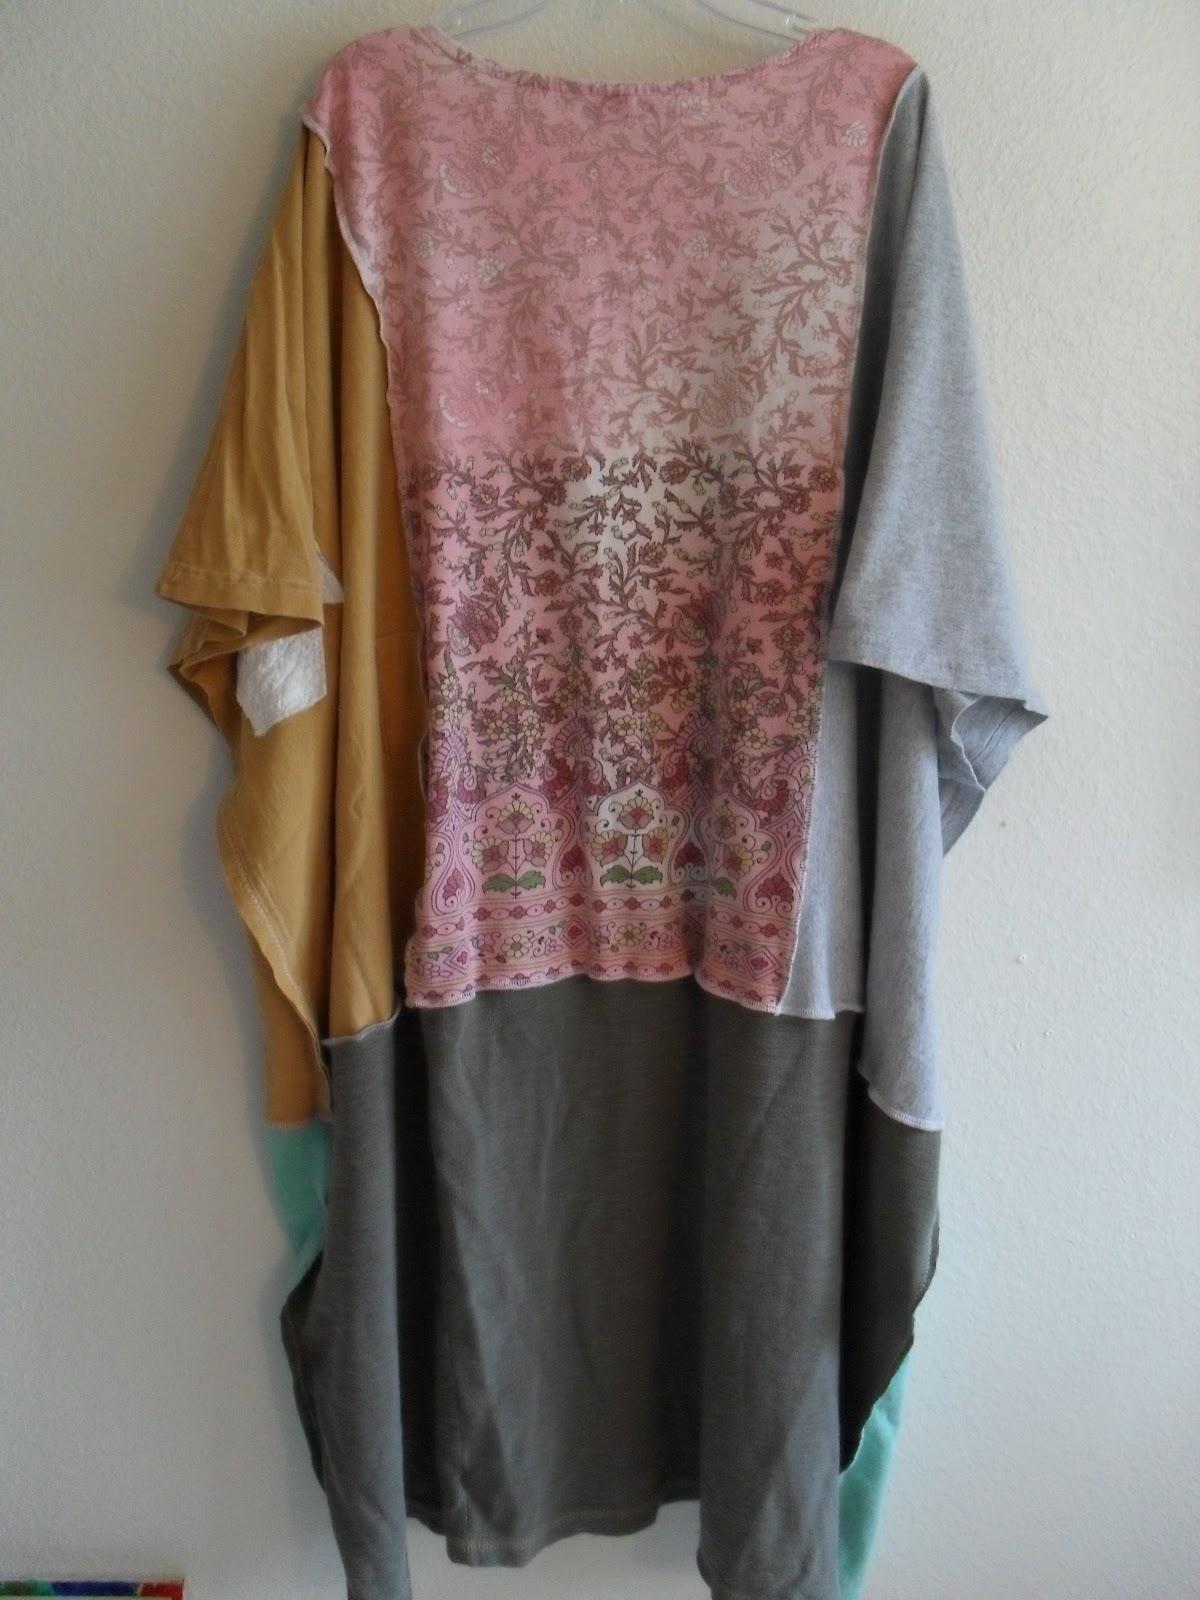 Recyclable Fashion: Recycled Fashion: TShirt Refashions And Recycled Fashion